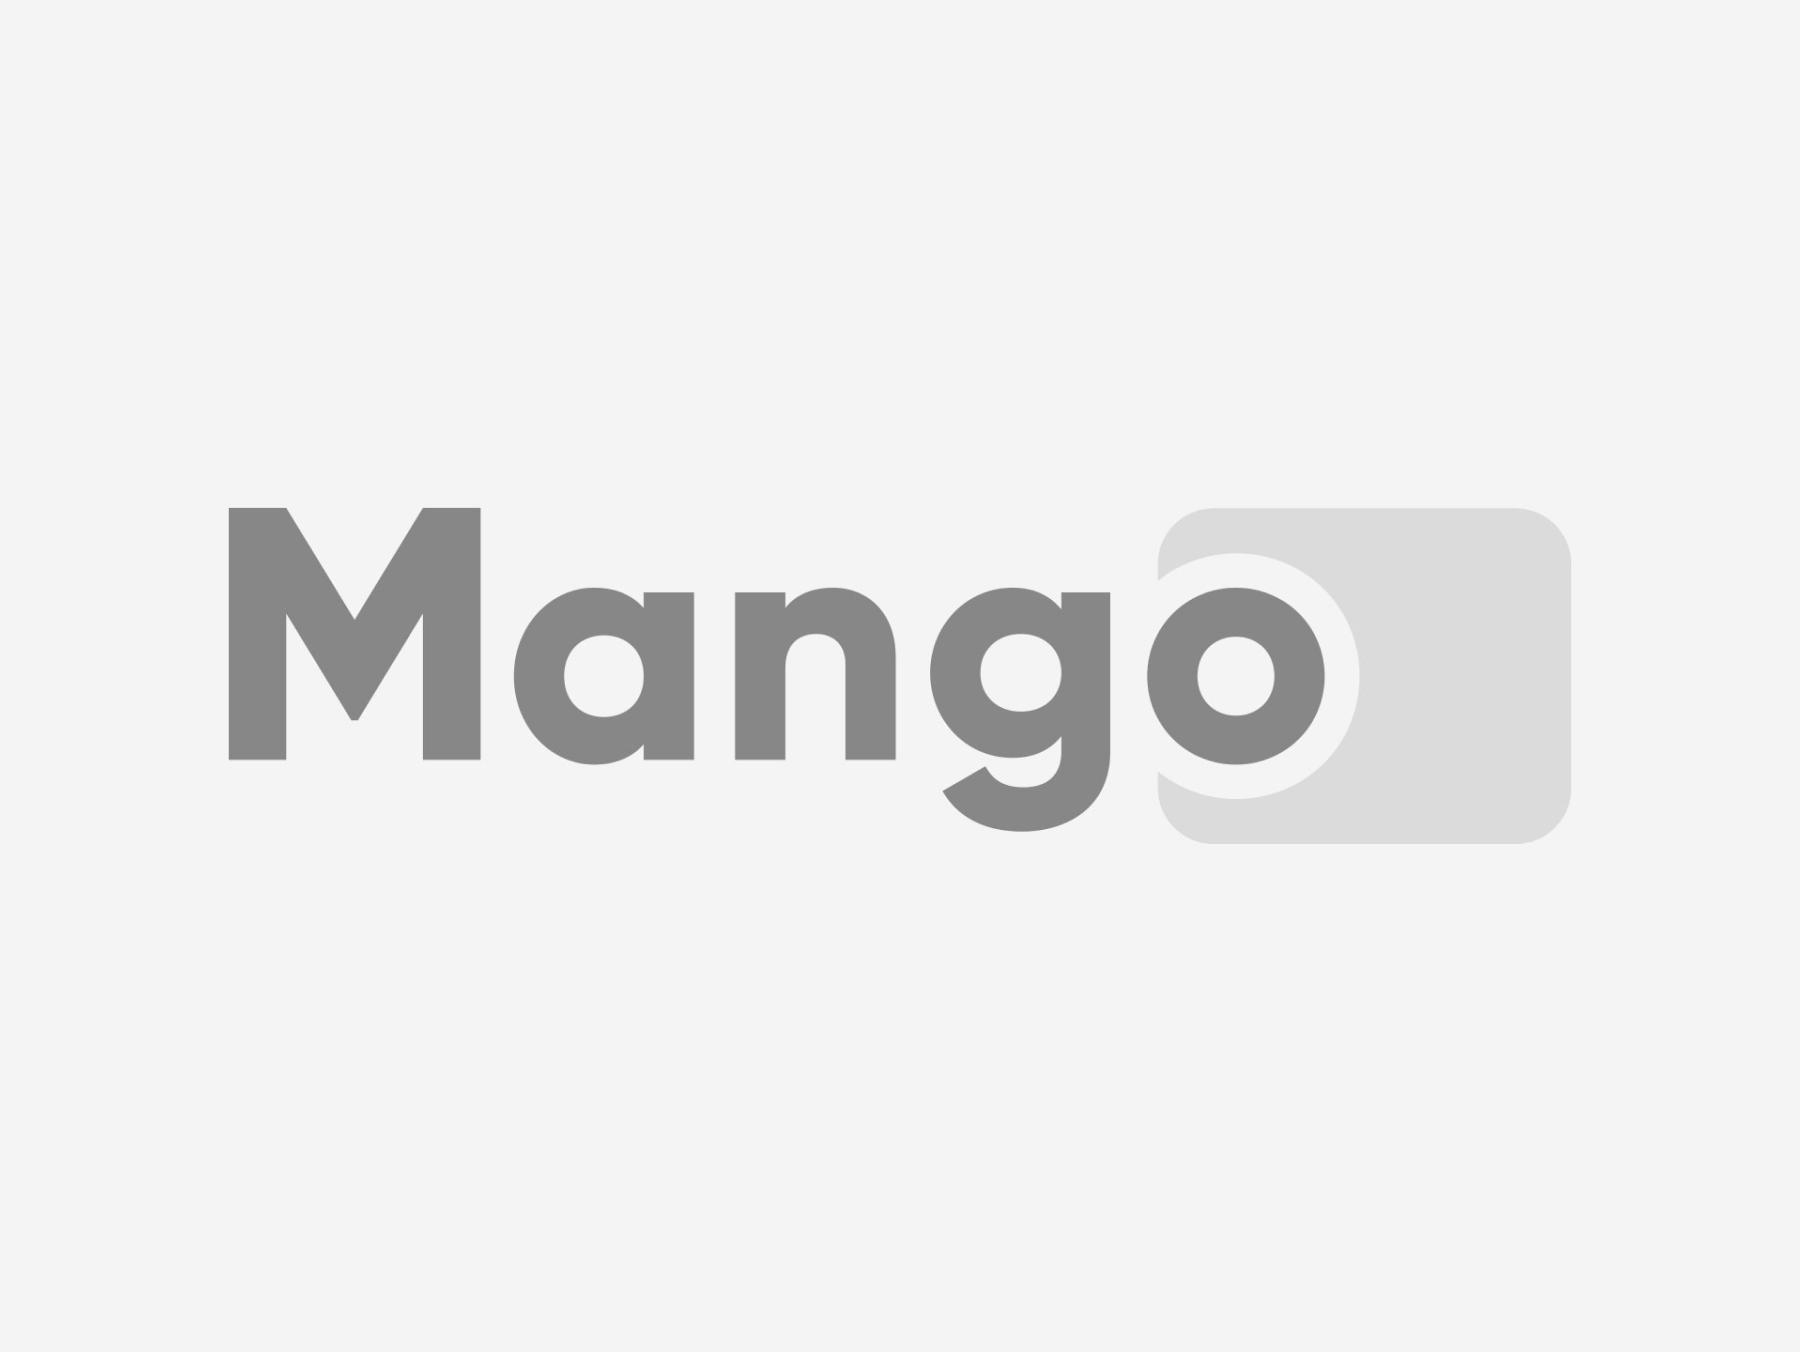 Balerini, Sporty 4.0 Walkmaxx Comfort